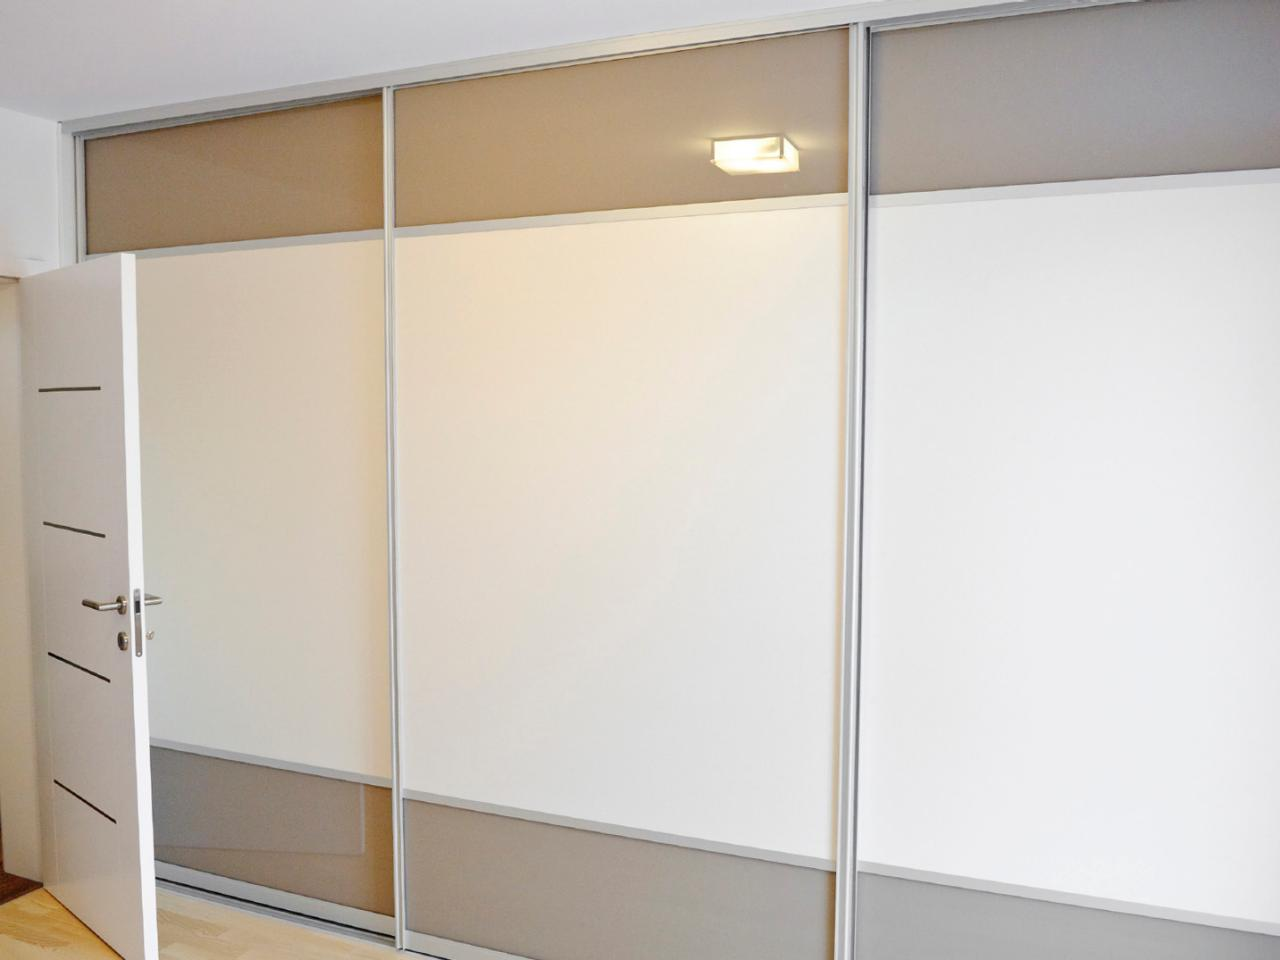 Pictures of Sliding Closet Doors: Design Ideas and Options closet sliding doors